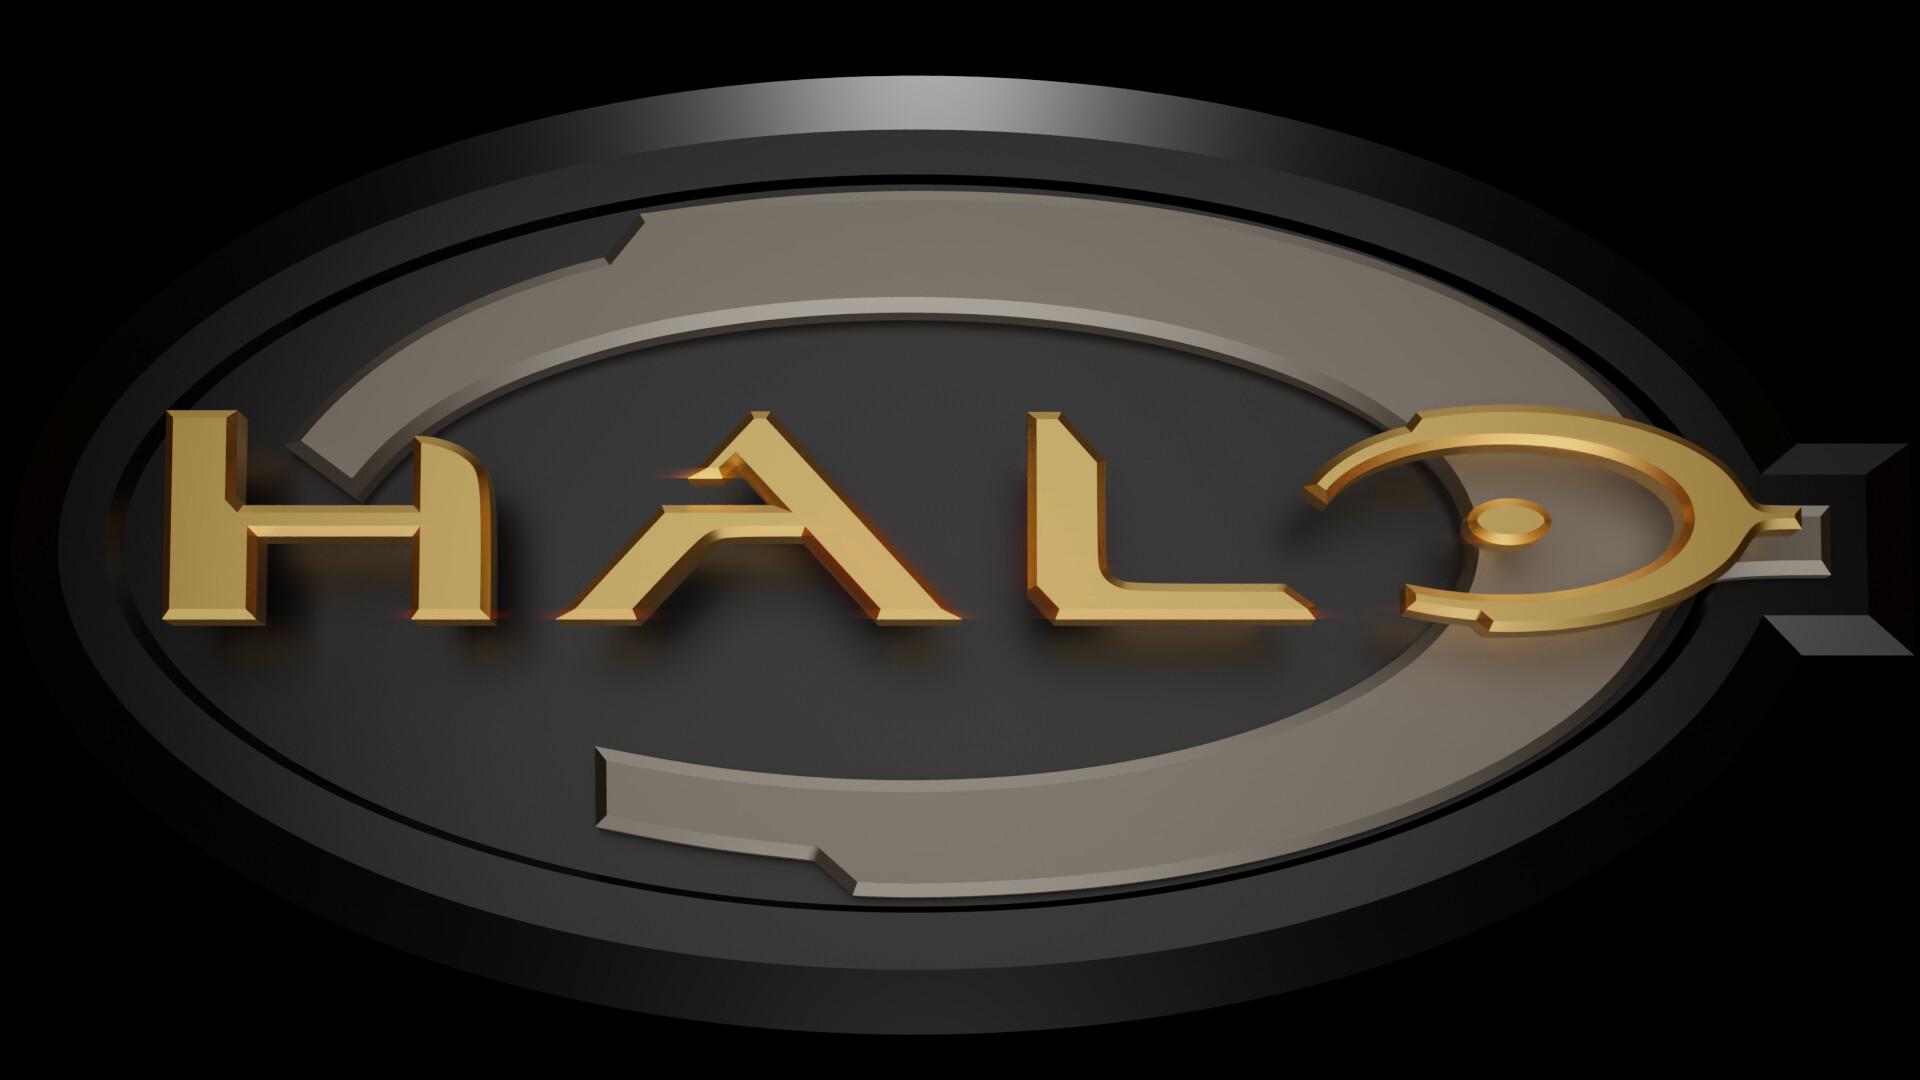 Artstation 3d Halo Logo Dan Tetreault Most relevant best selling latest uploads. artstation 3d halo logo dan tetreault